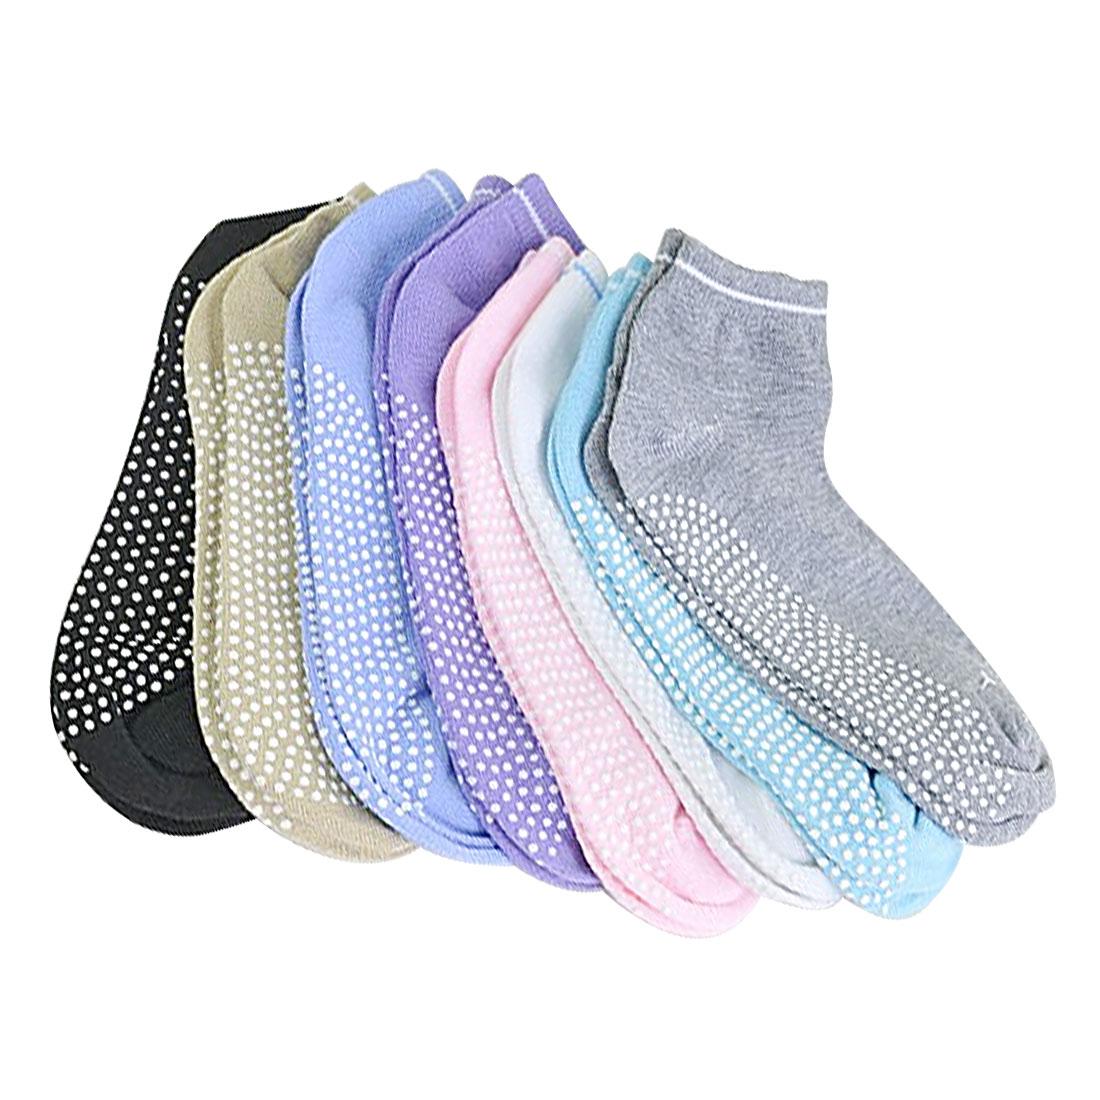 New Women Fitness Cotton Gym Sports Socks Non Slip Massage Yoga Pilates Socks 6 Colors New